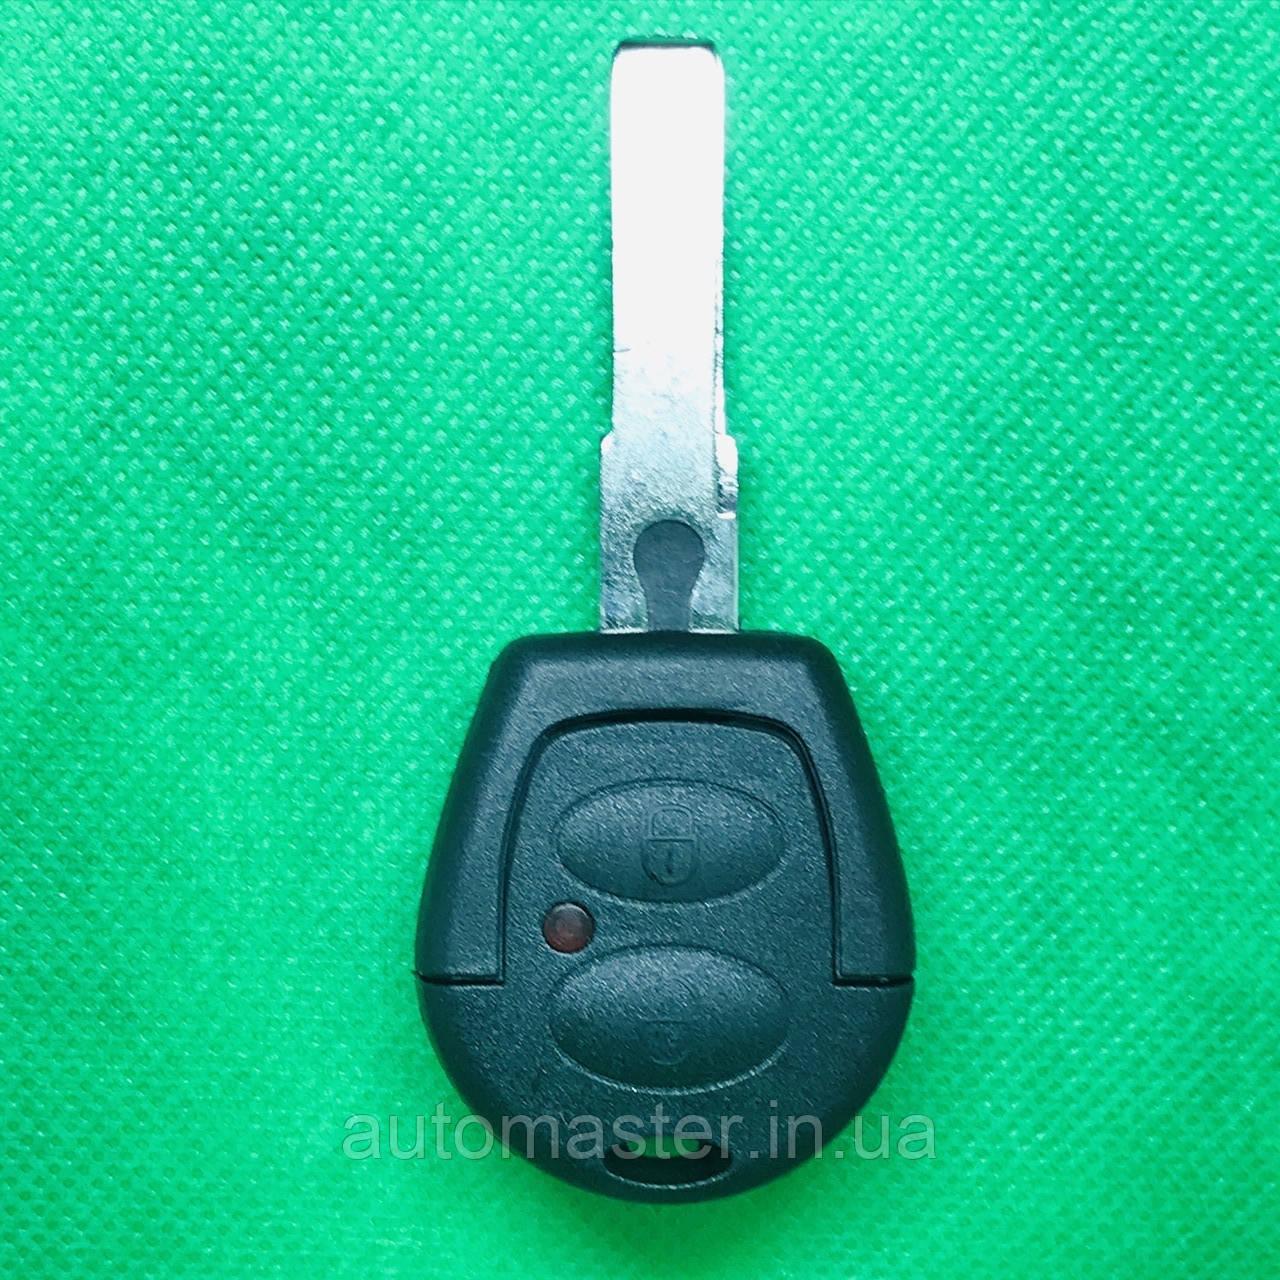 Корпус автоключа Volkswagen Polo, Golf, Jetta, Sharan (Фольксваген) 2 кнопки